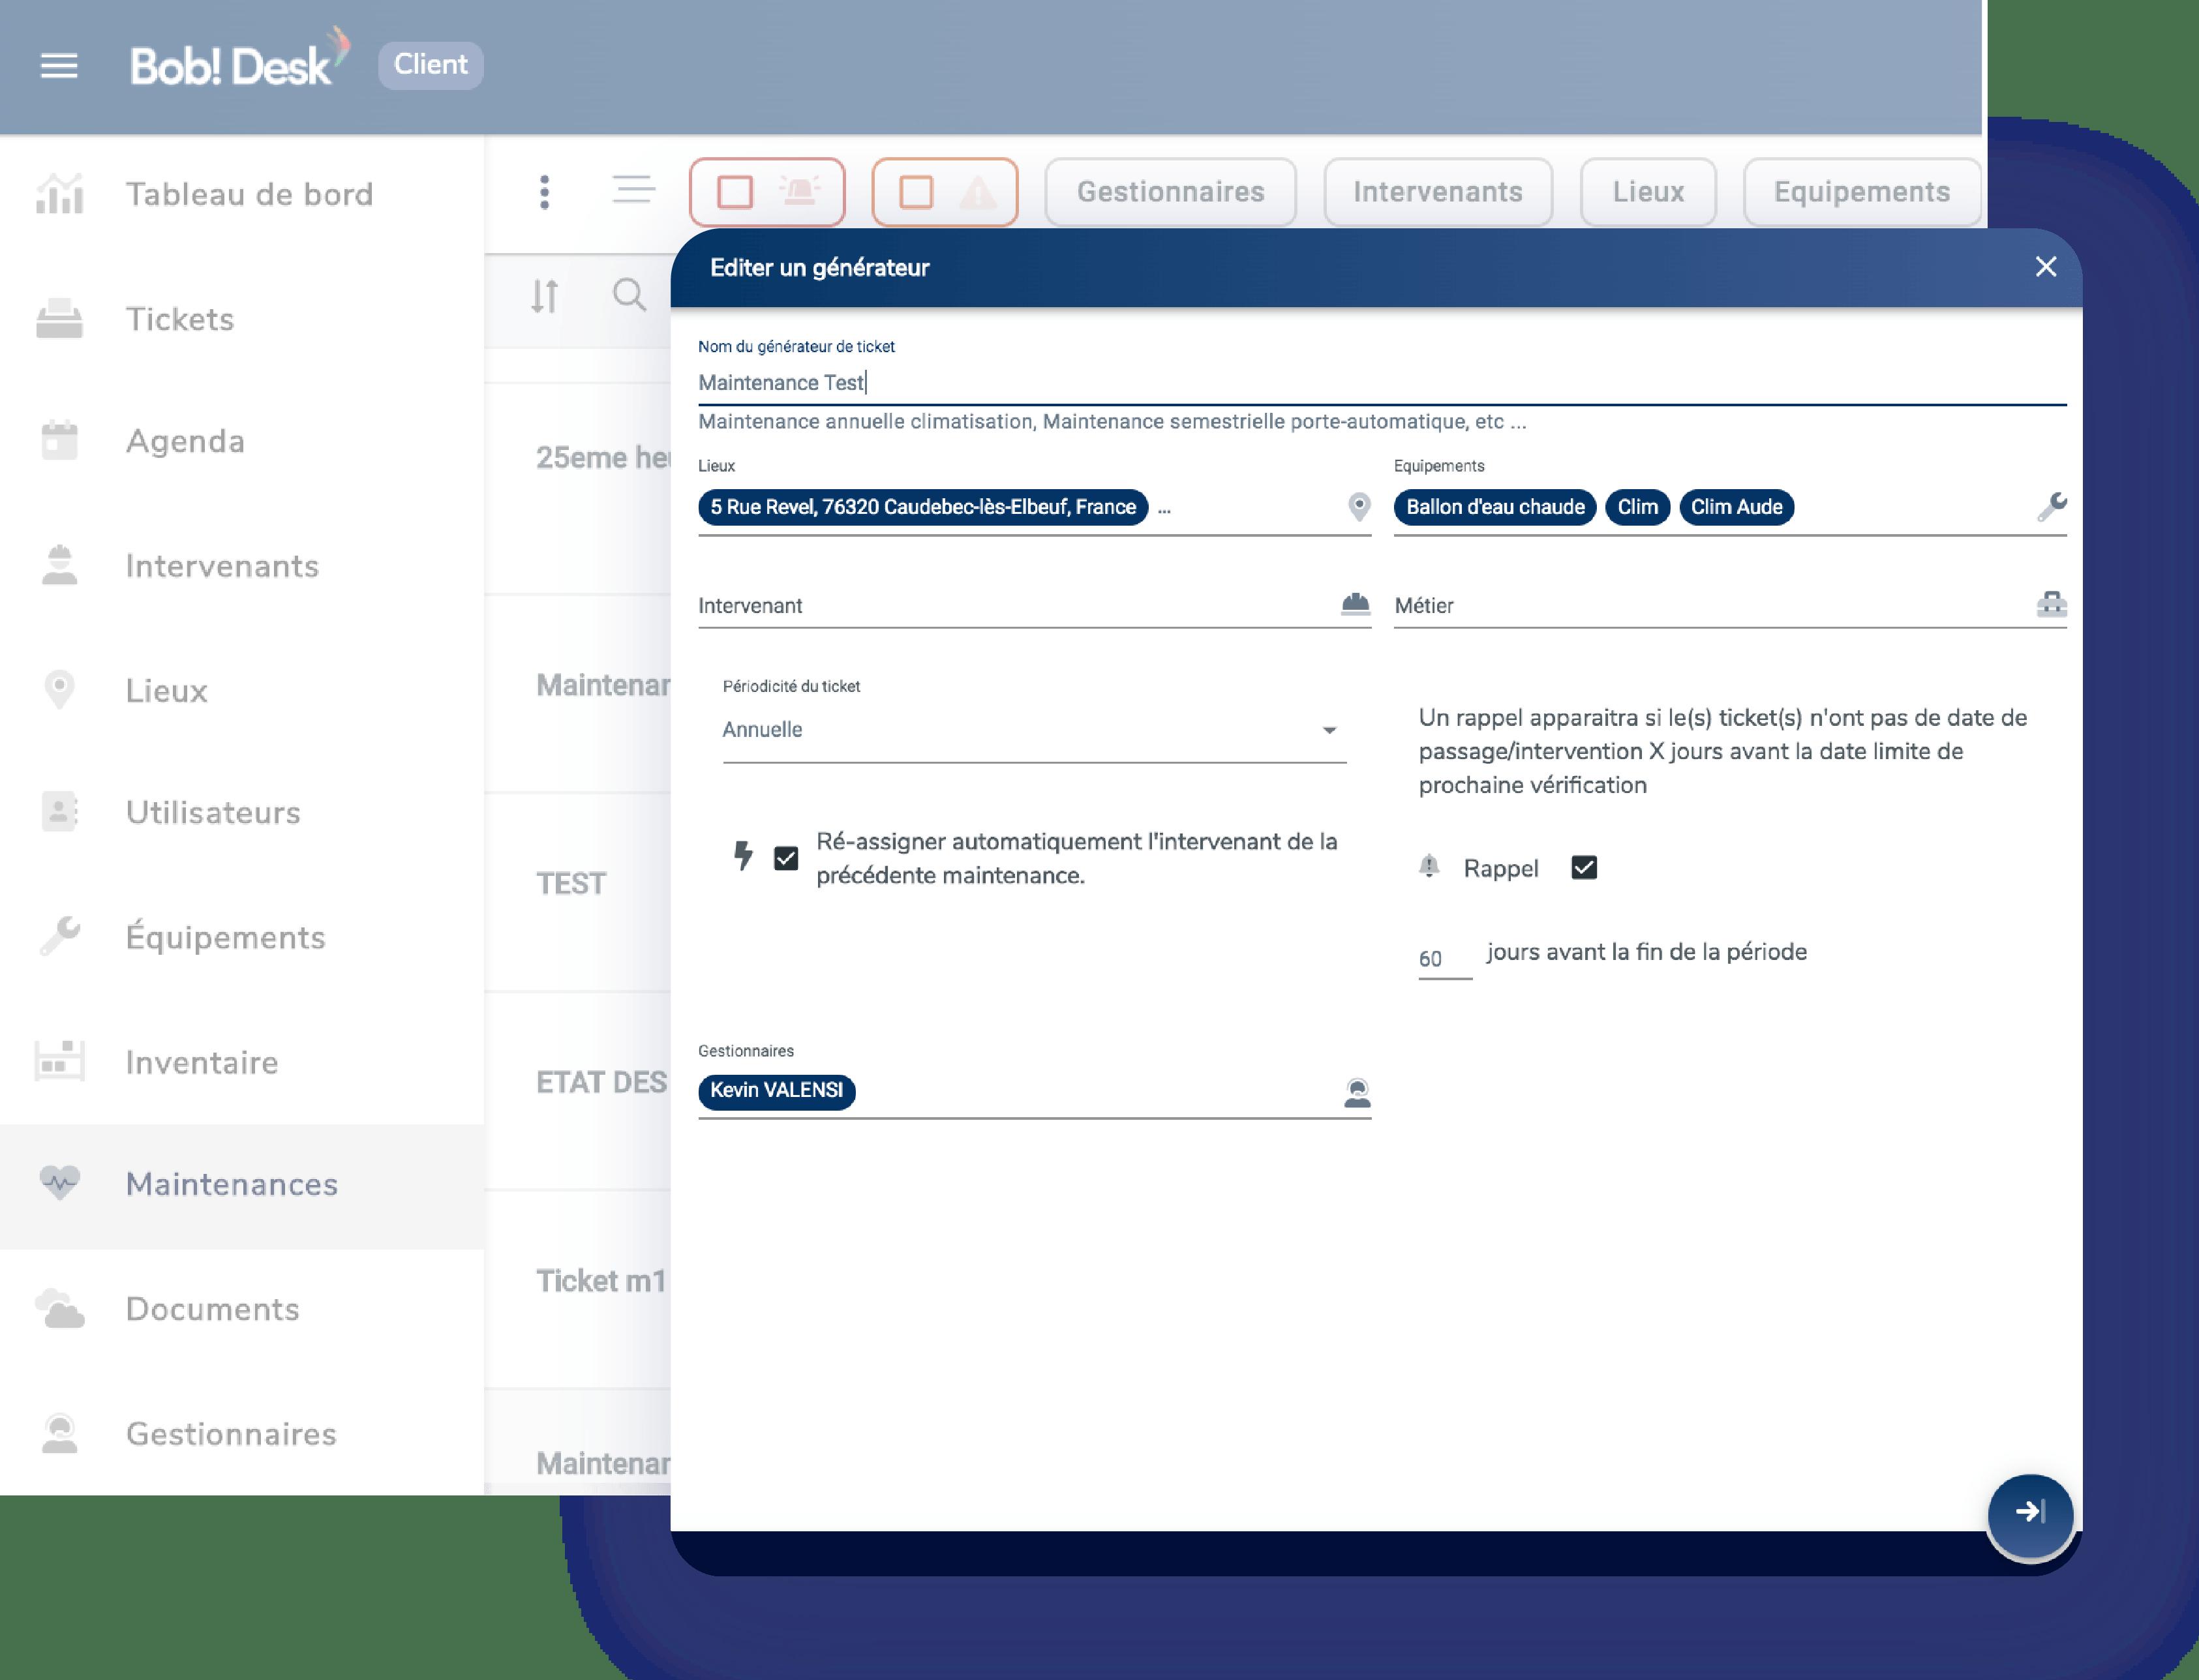 Bob Desk - GMAO - Maintenance fonctionnalites - gestion